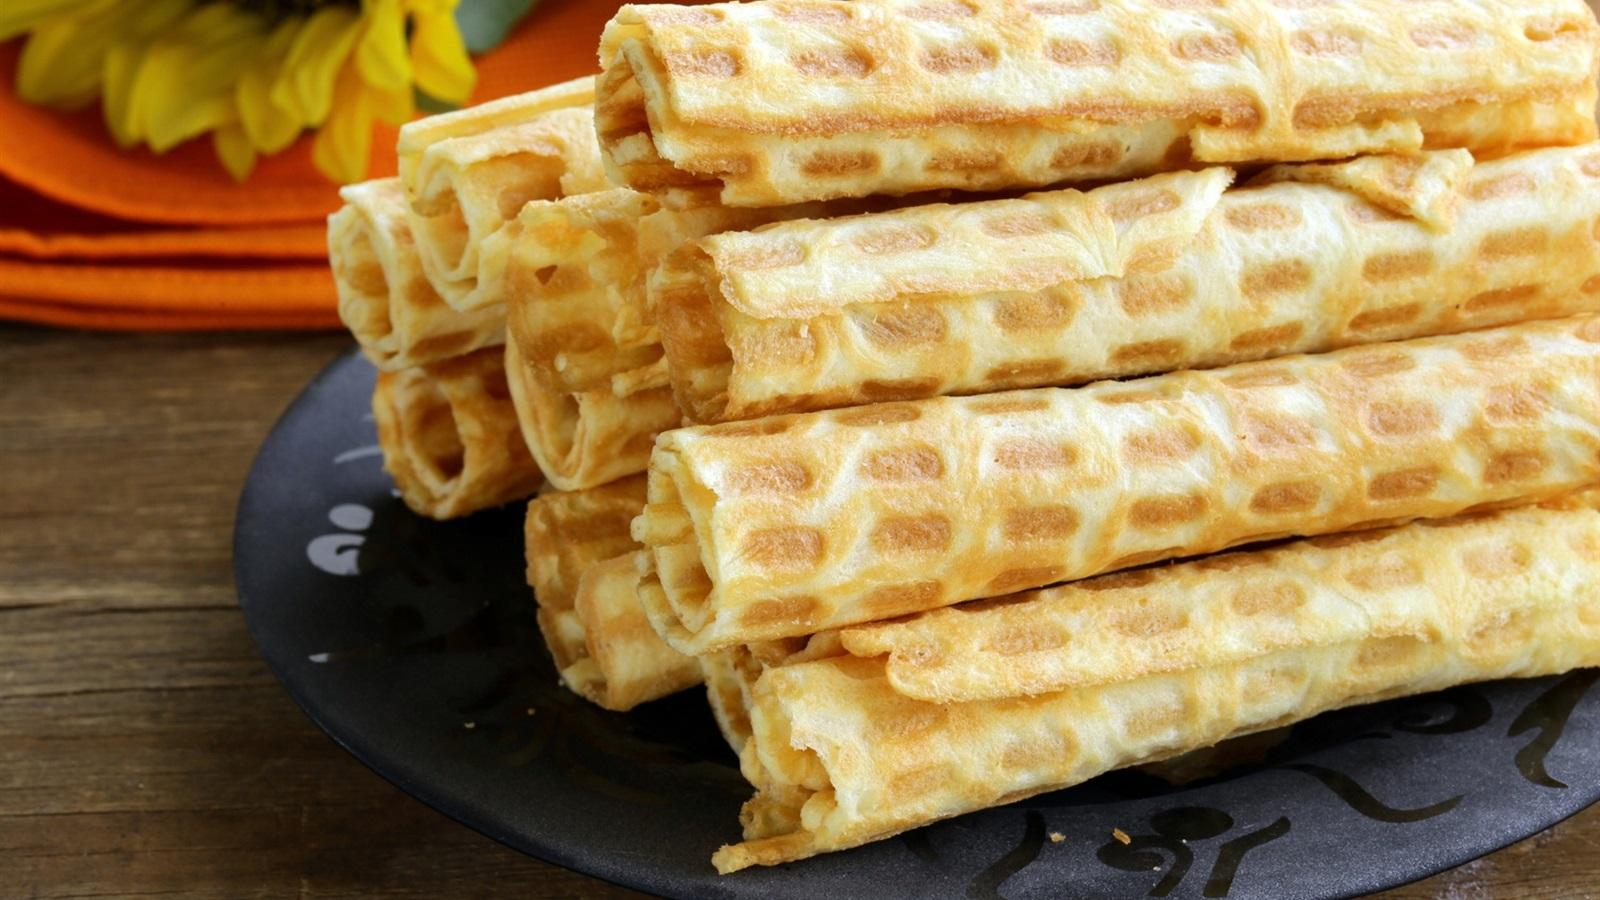 waffles wallpaper 2560x1600 - photo #29